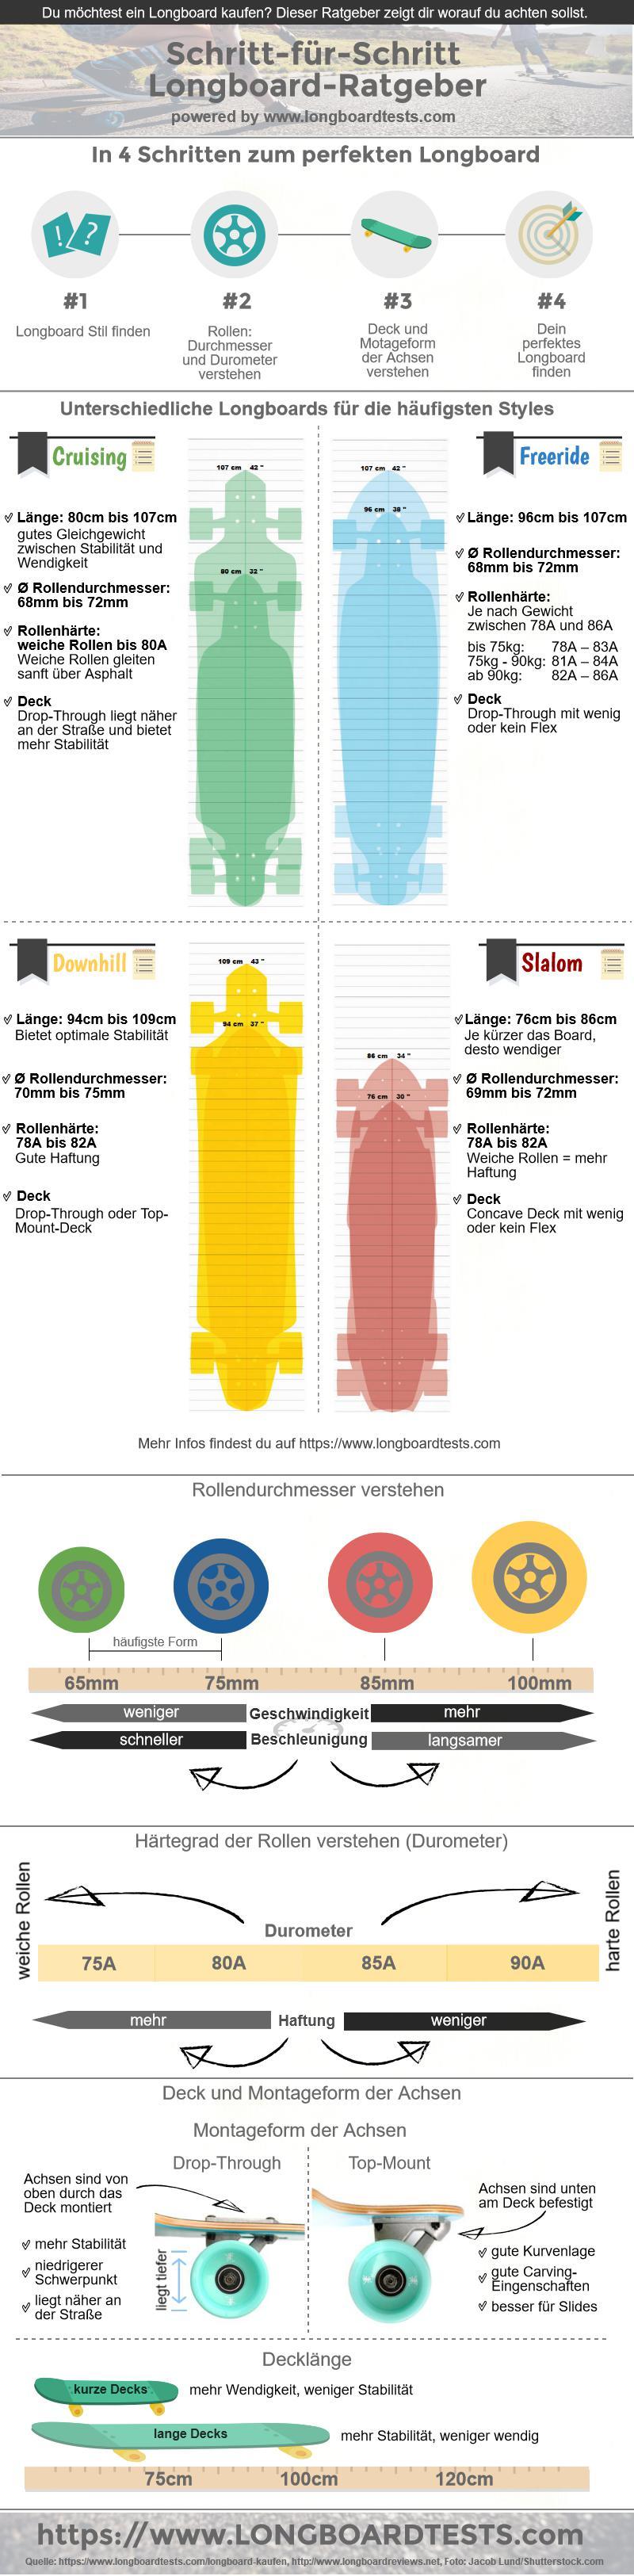 Longboard kaufen: Der Ratgeber als Infografik